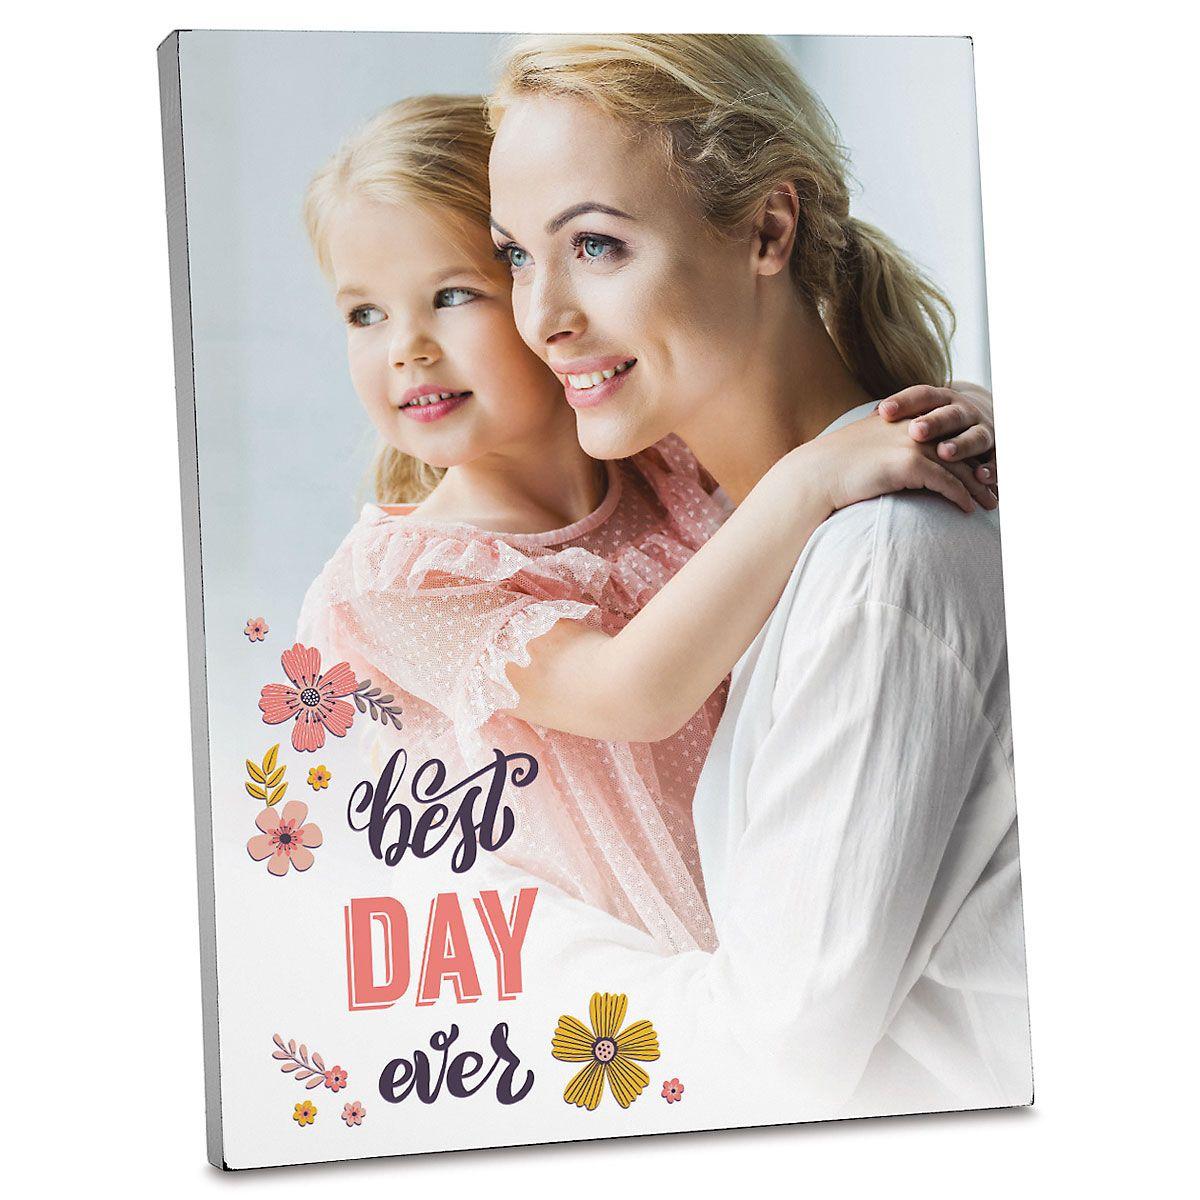 Floral Personalized Photo Plaque